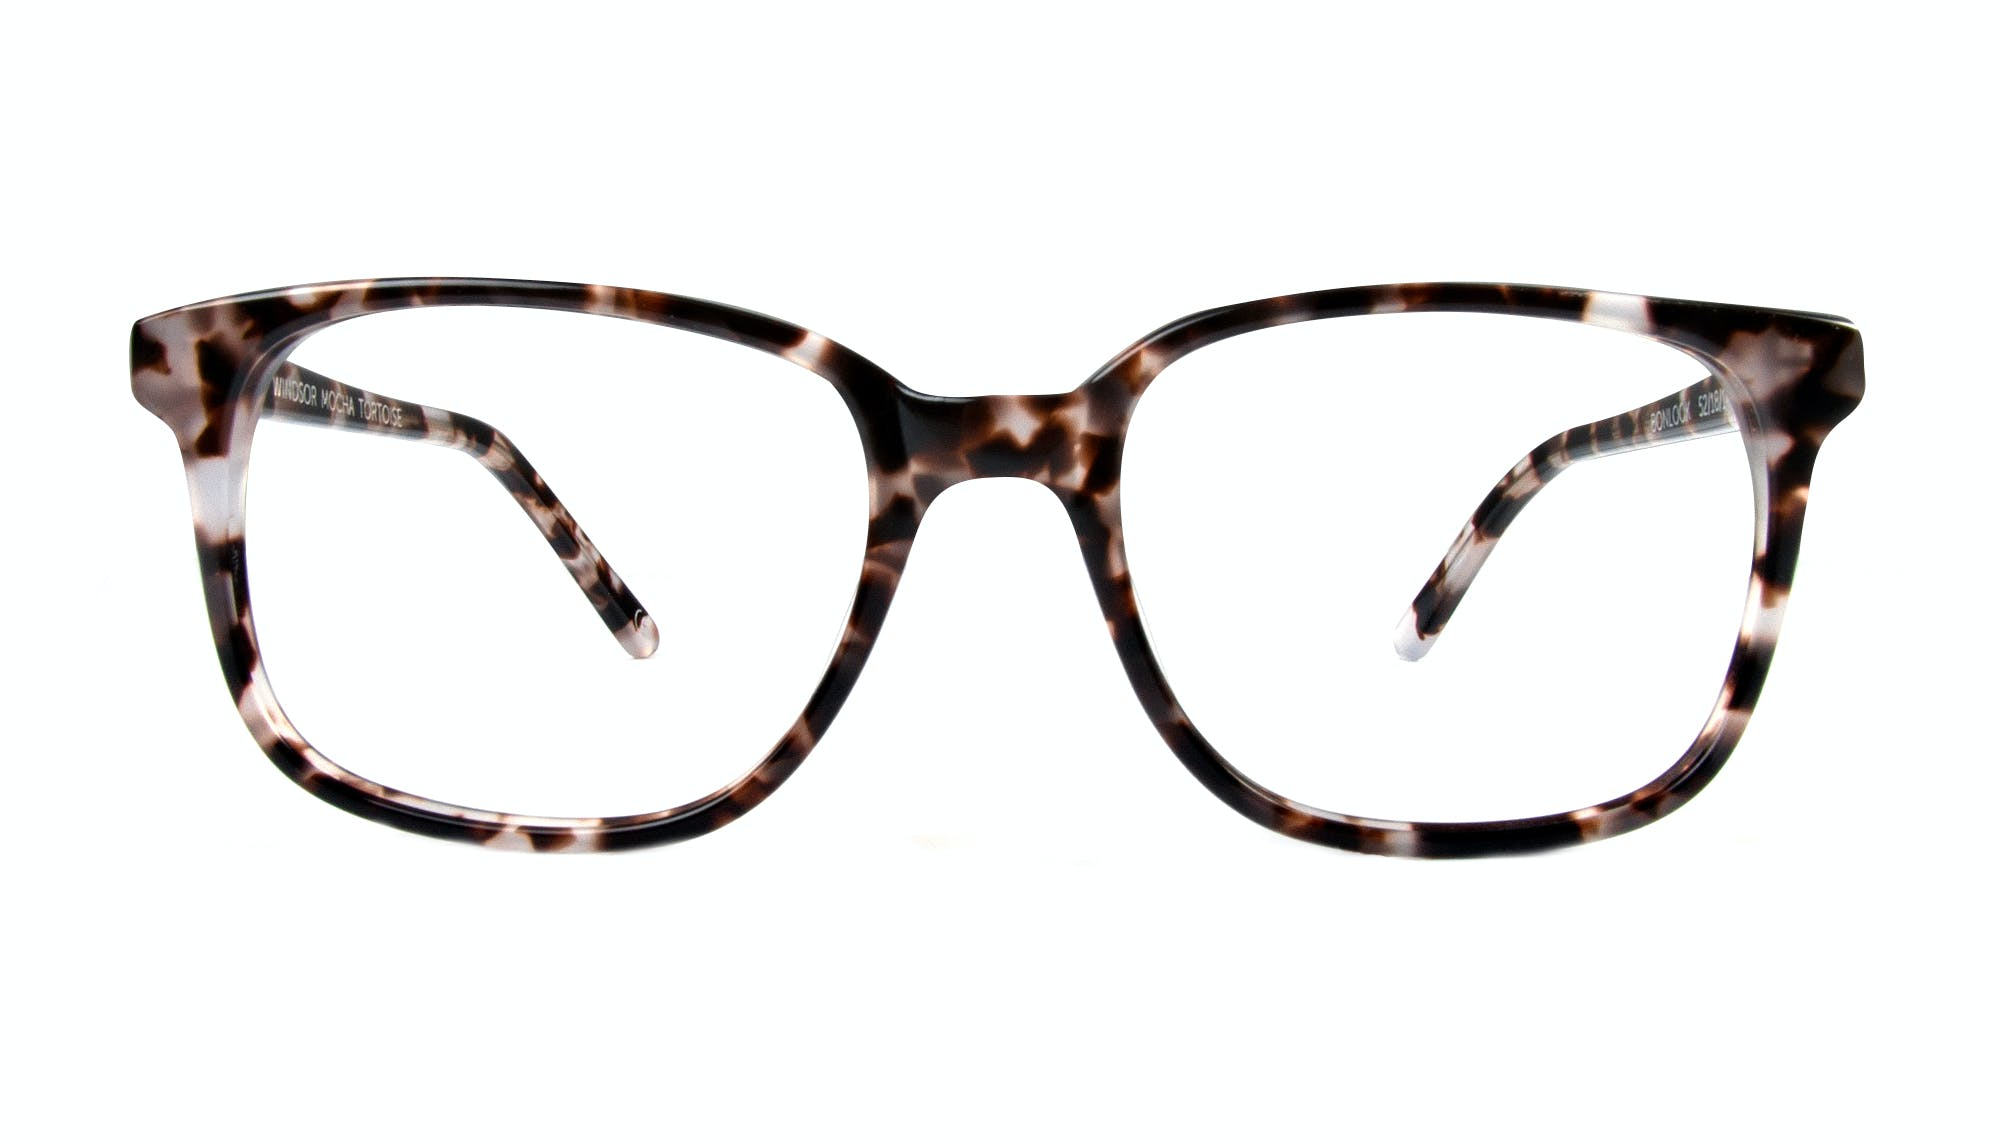 Affordable Fashion Glasses Rectangle Square Eyeglasses Women Windsor Mocha Tortoise